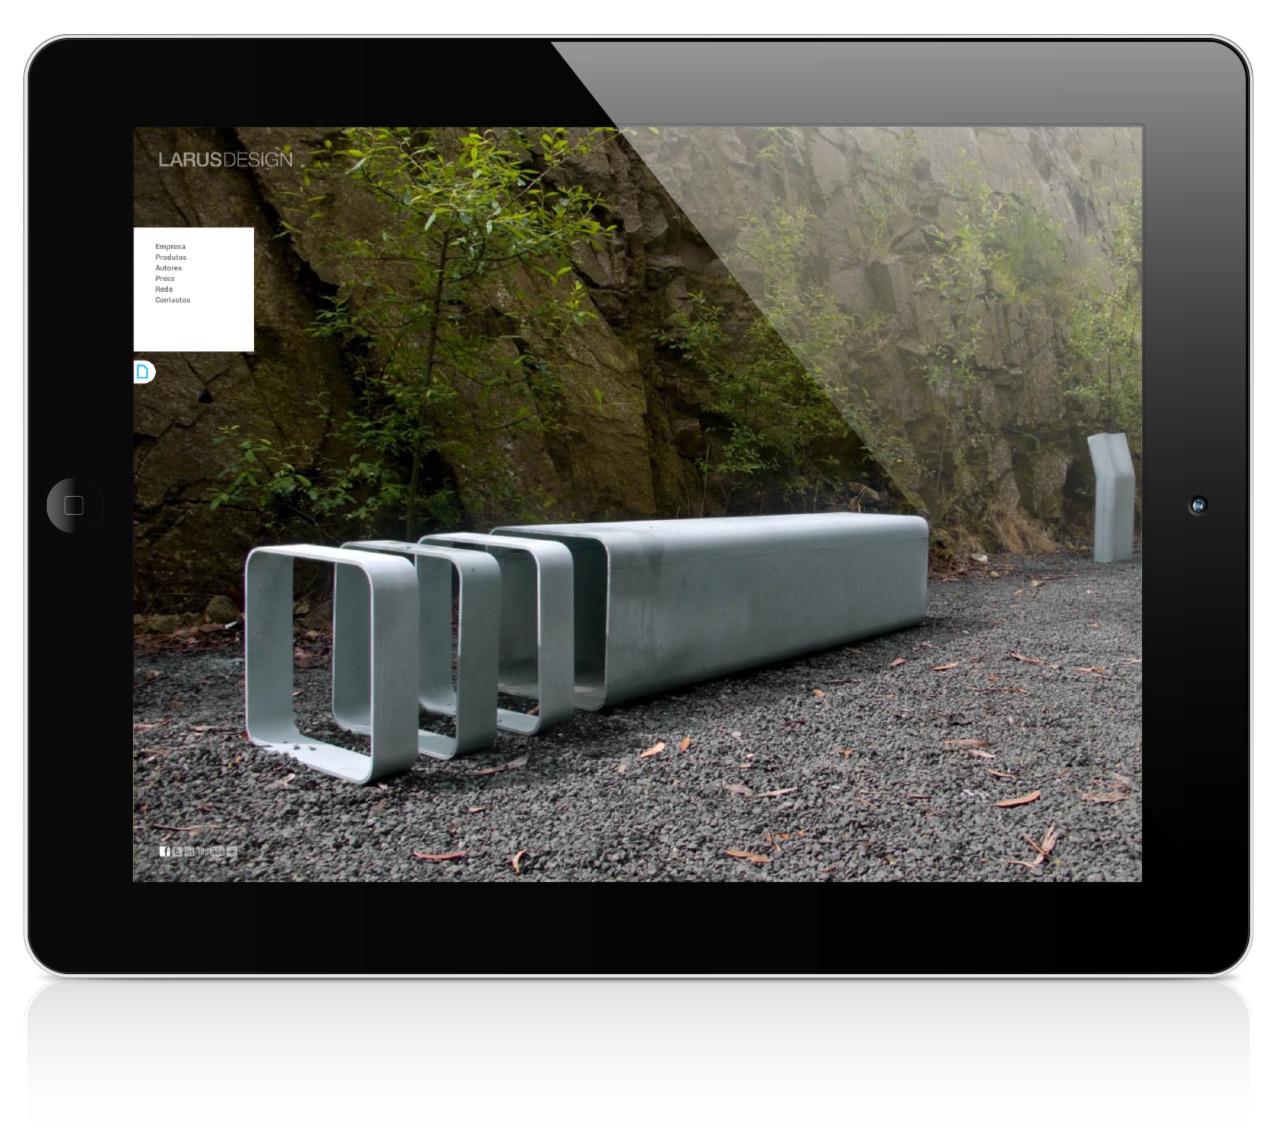 larus-website